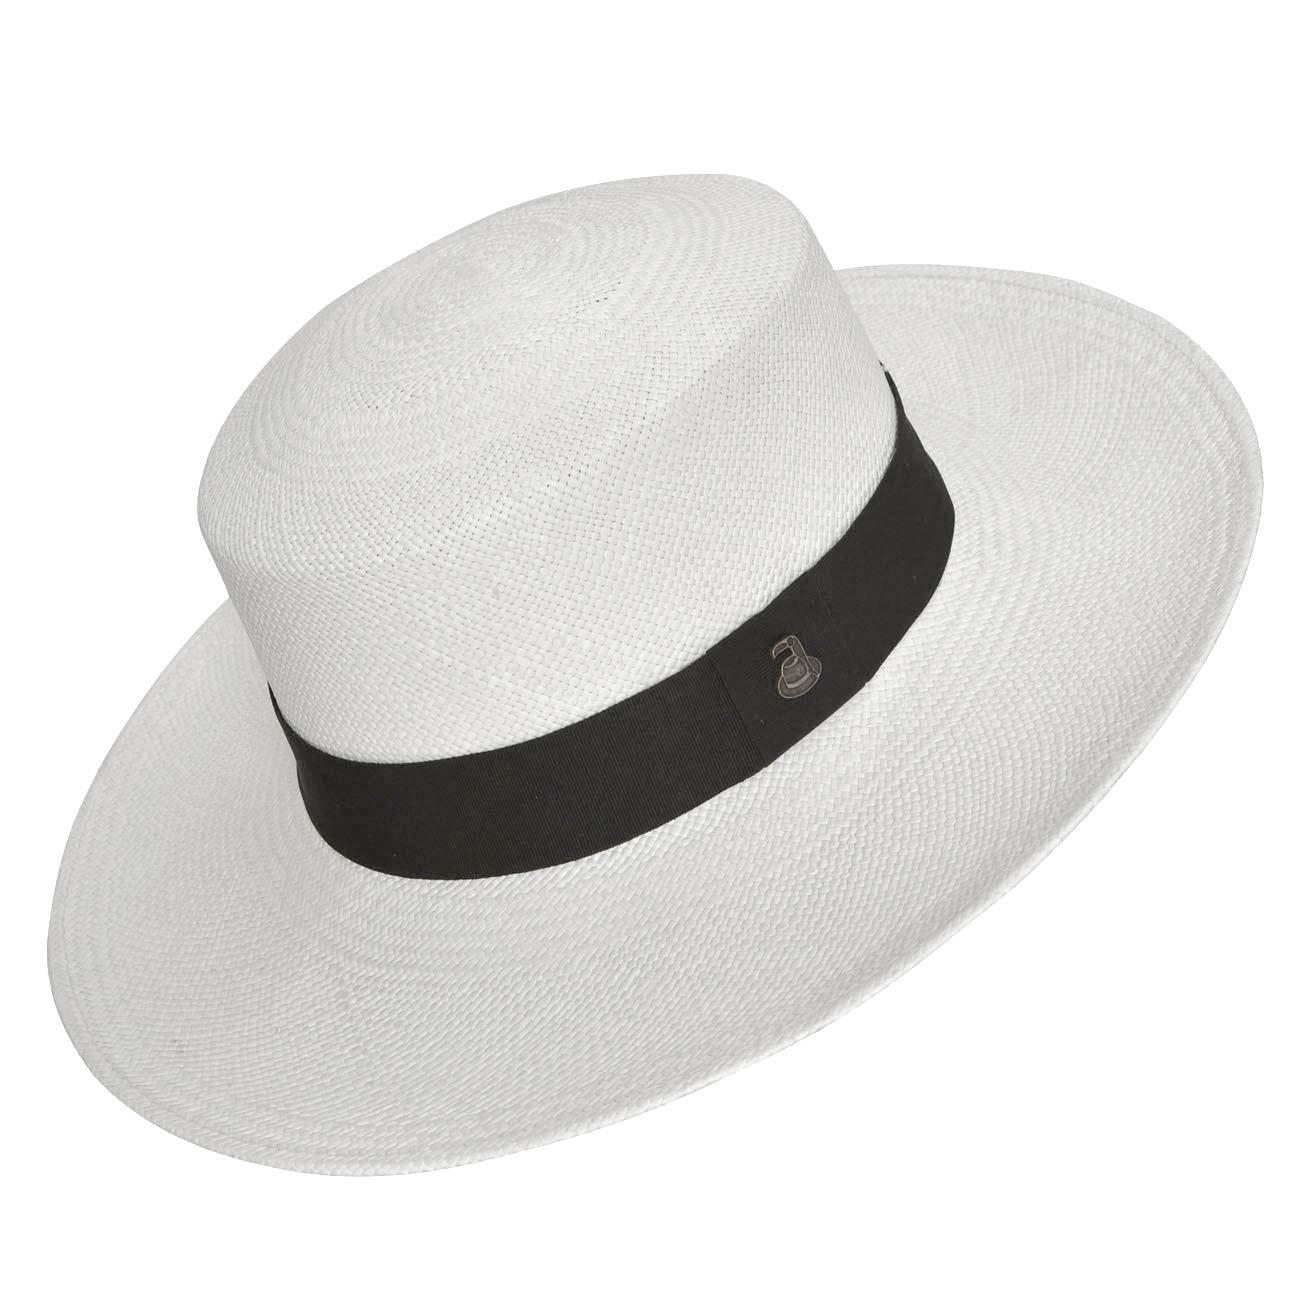 347763de5 Original Panama Hat - Wide Brim Flat Top - Toquilla Straw - Handmade in  Ecuador by Ecua-Andino